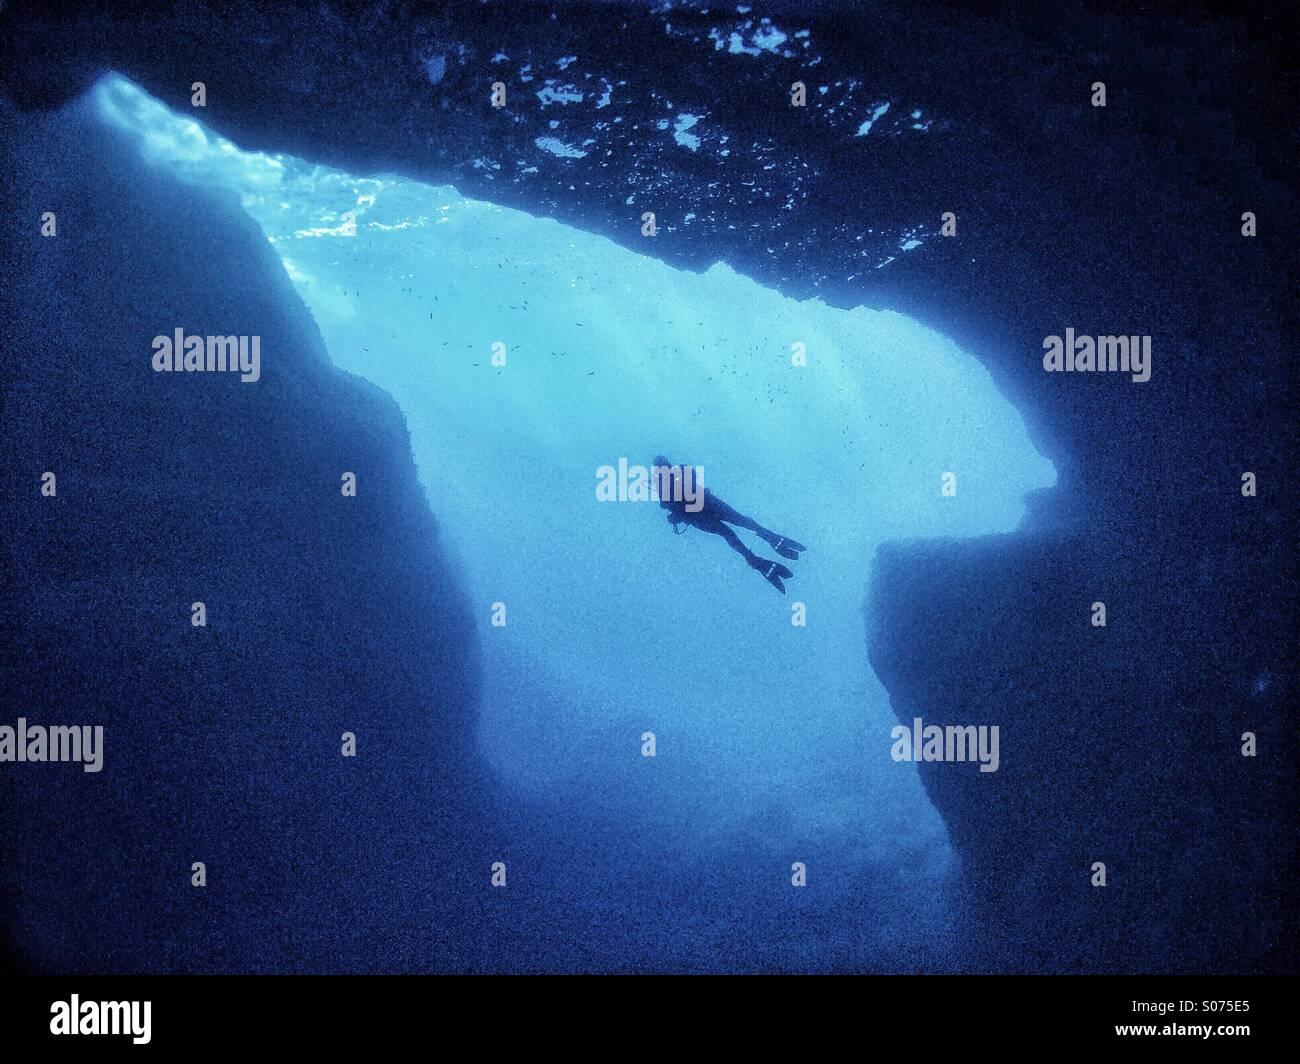 Mature male scuba diver swimming across underwater cavern - Stock Image